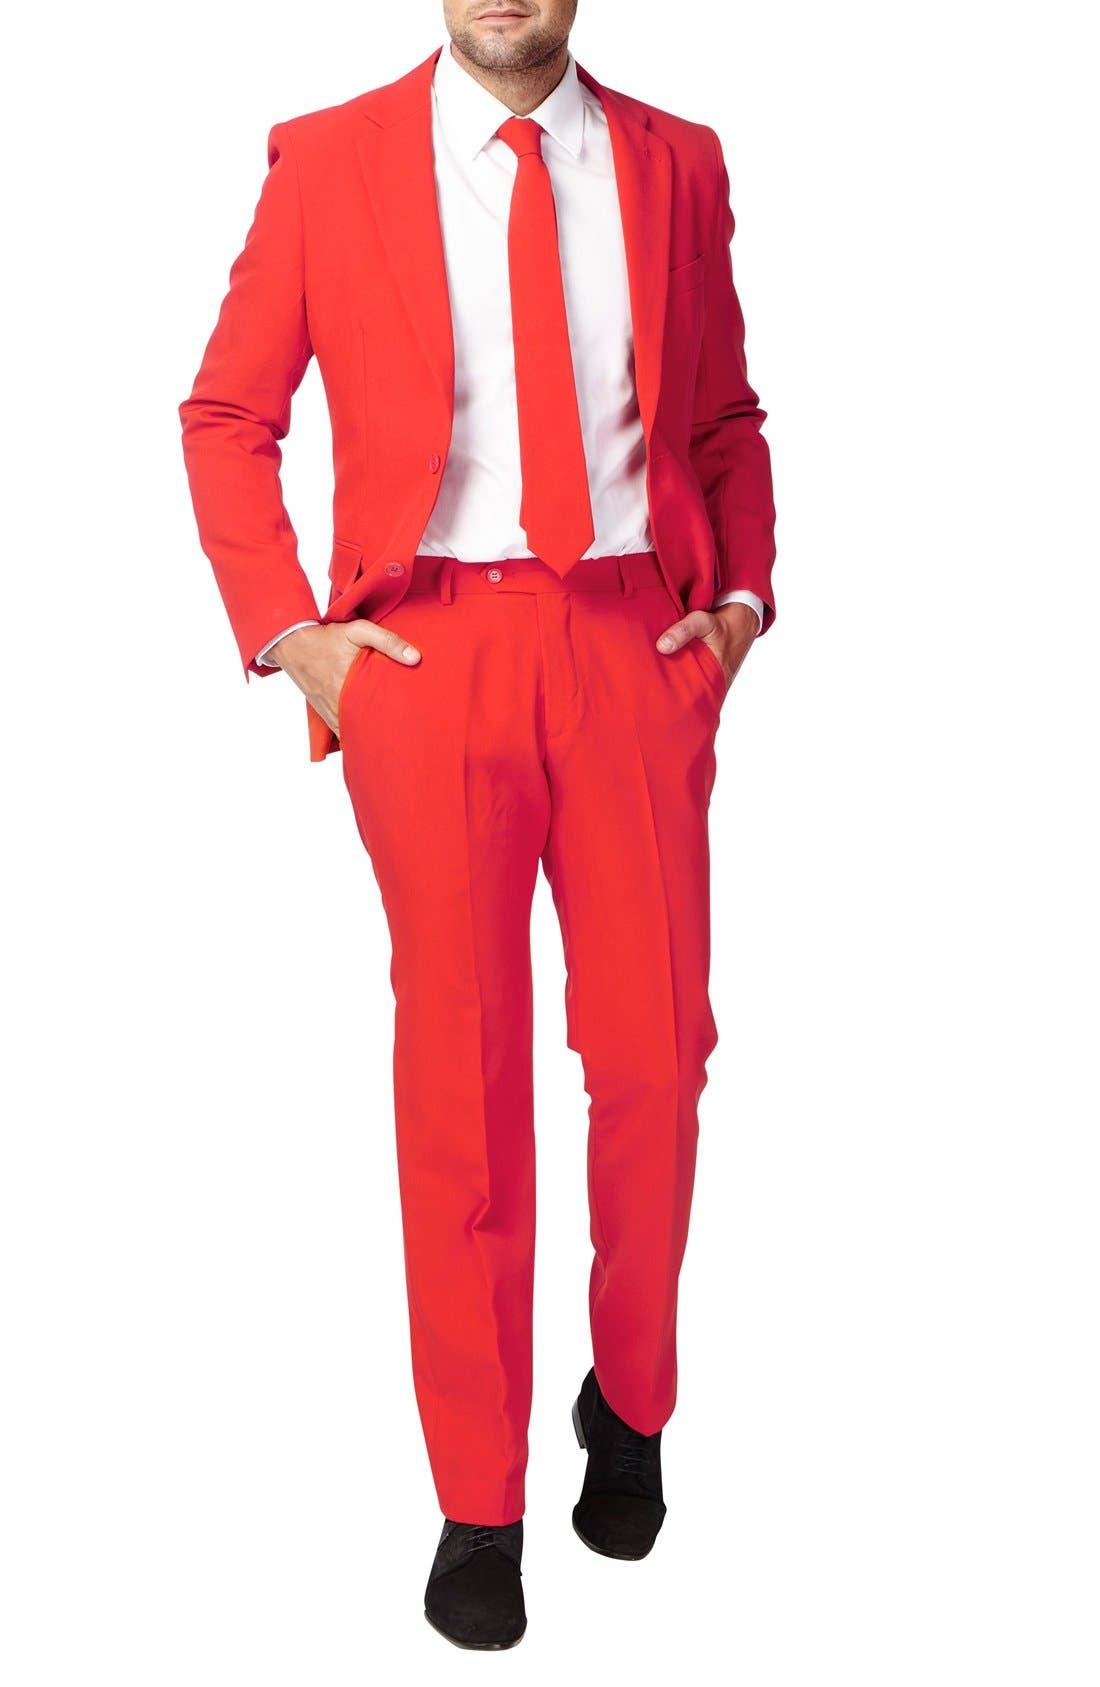 OppoSuit 'Red Devil' Trim Fit Two-Piece Suit with Tie,                         Main,                         color, 610